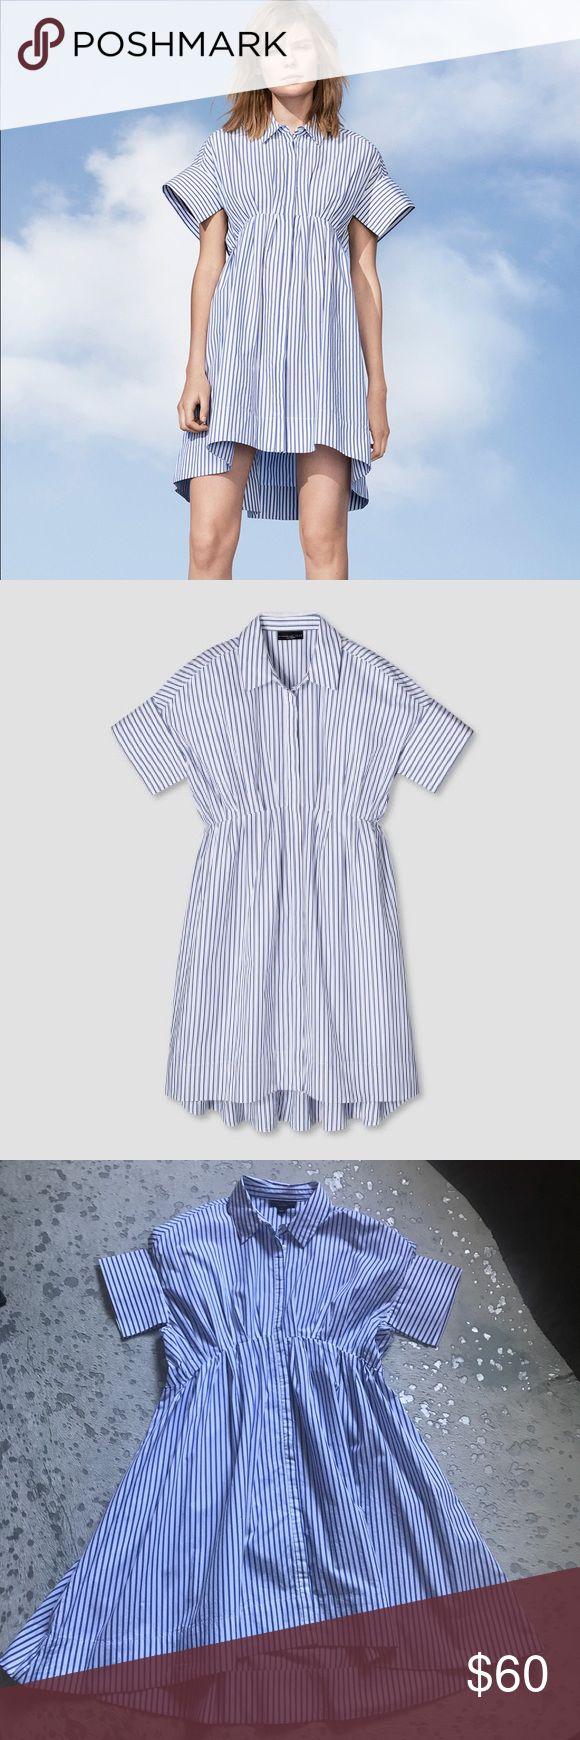 Victoria Beckham target dress Victoria Beckham for target dress. Blue and white pin stripe. Hidden button up. Very flattering. Excellent condition. 100% cotton Victoria Beckham for Target Dresses